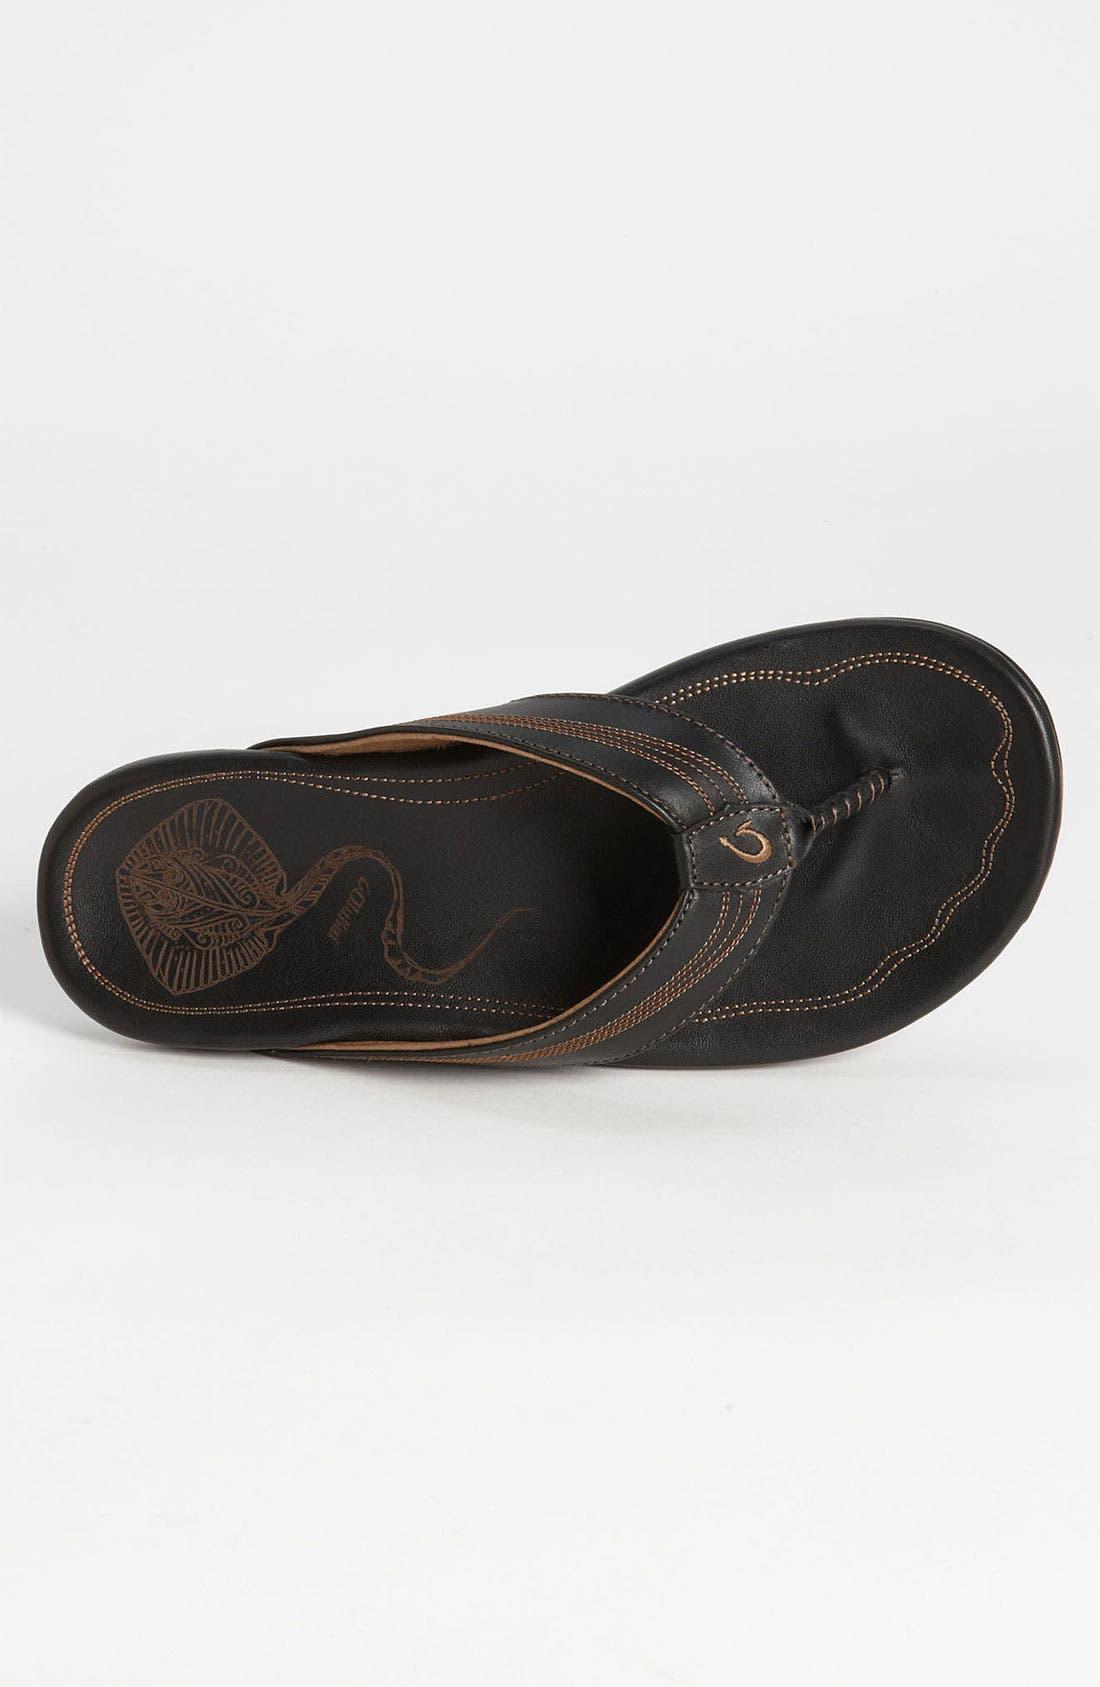 Alternate Image 3  - OluKai 'Manini' Flip Flop (Men)